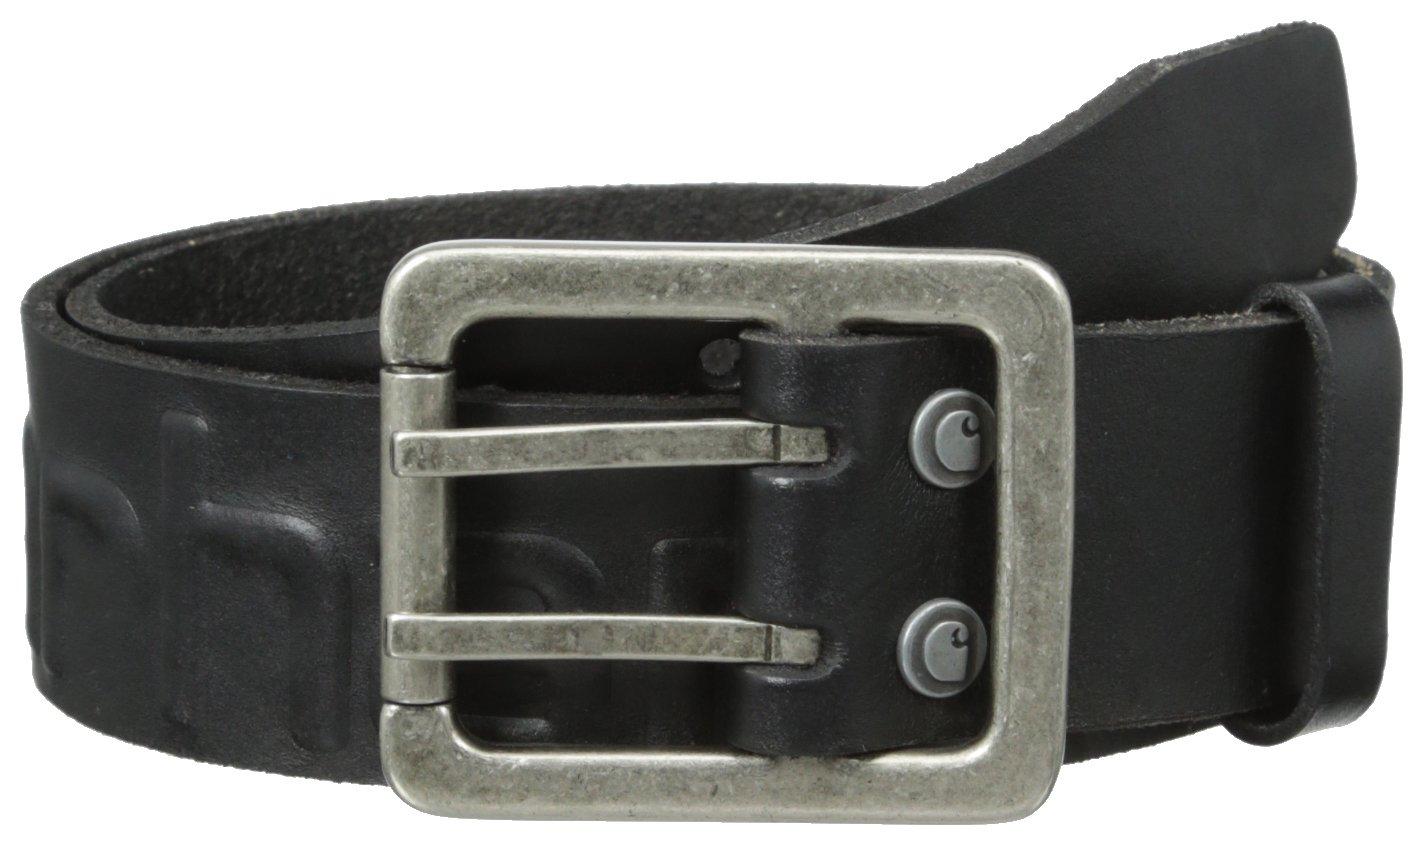 W34 Carhartt .2217.BRN.S534 Logo Belt Brown 34